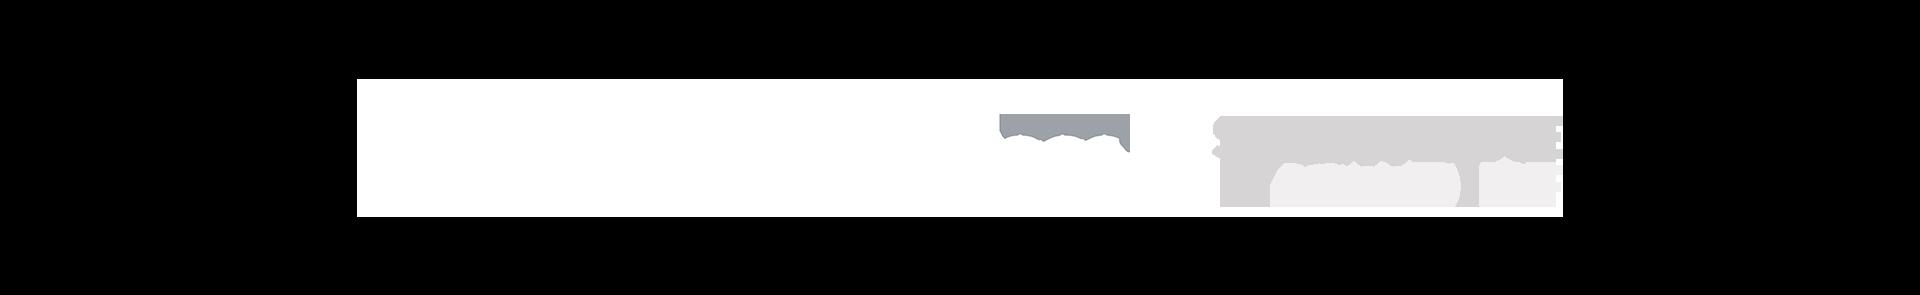 DIFF Programs